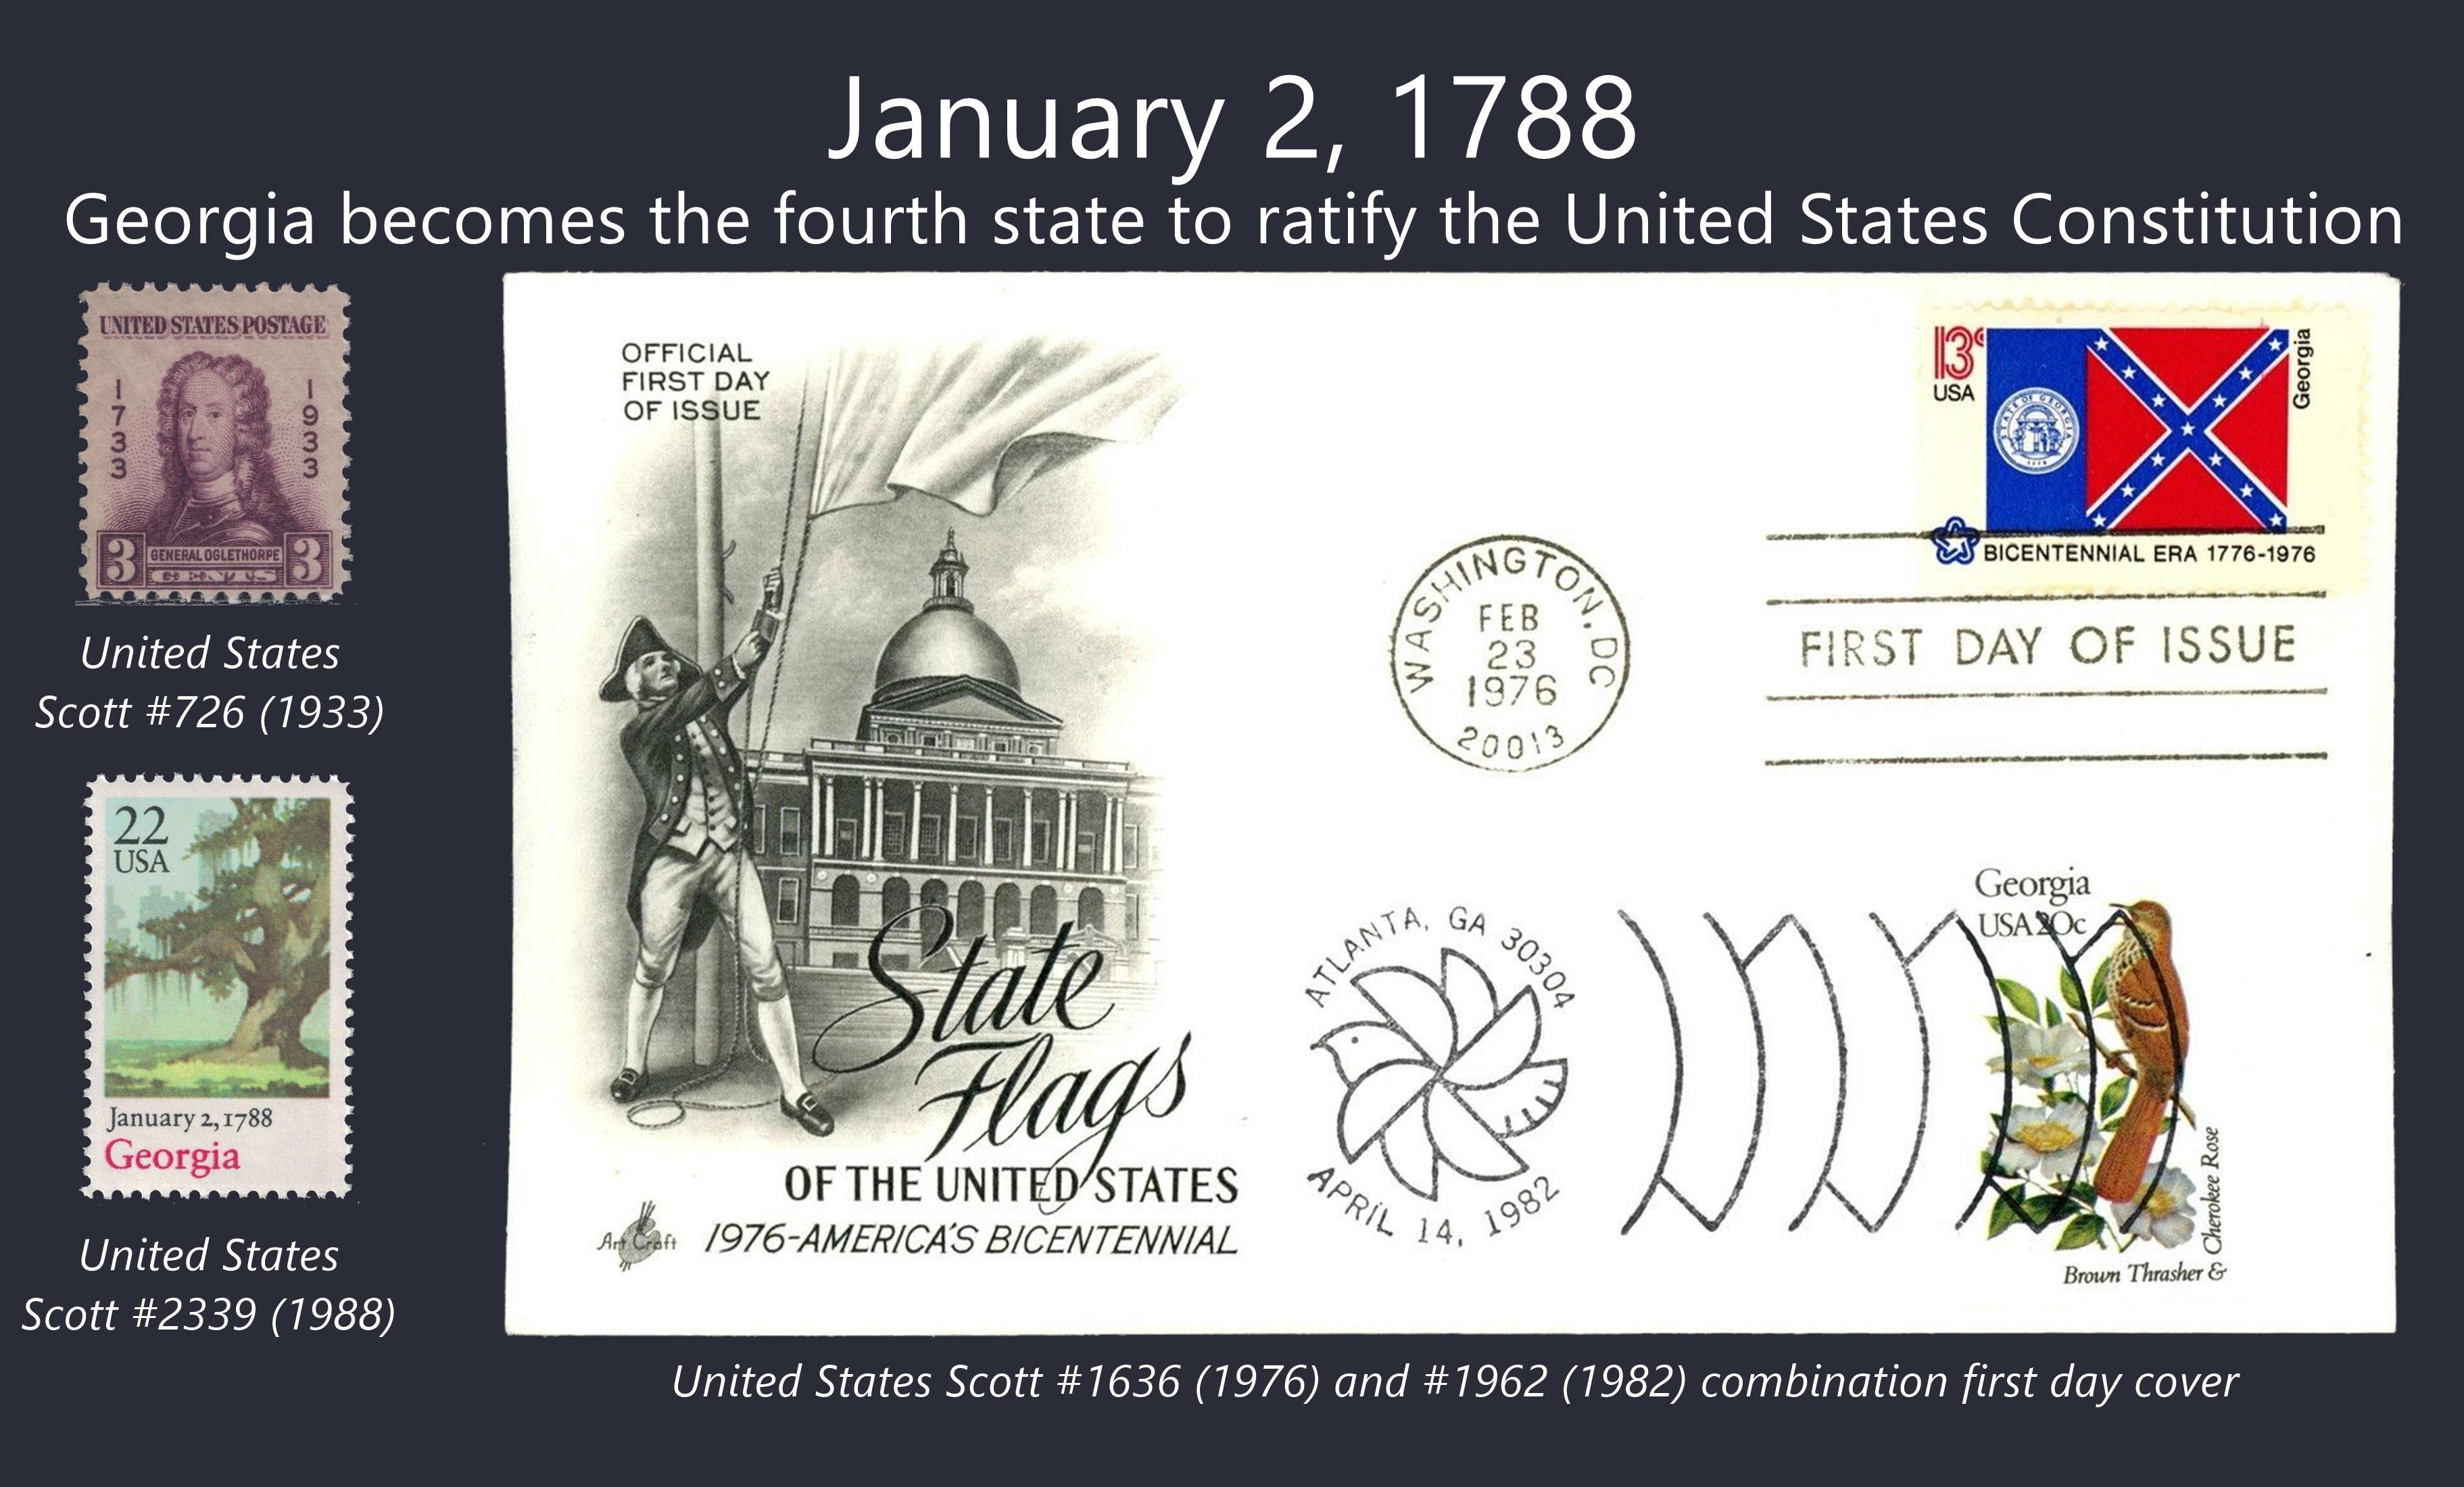 January 2, 1788